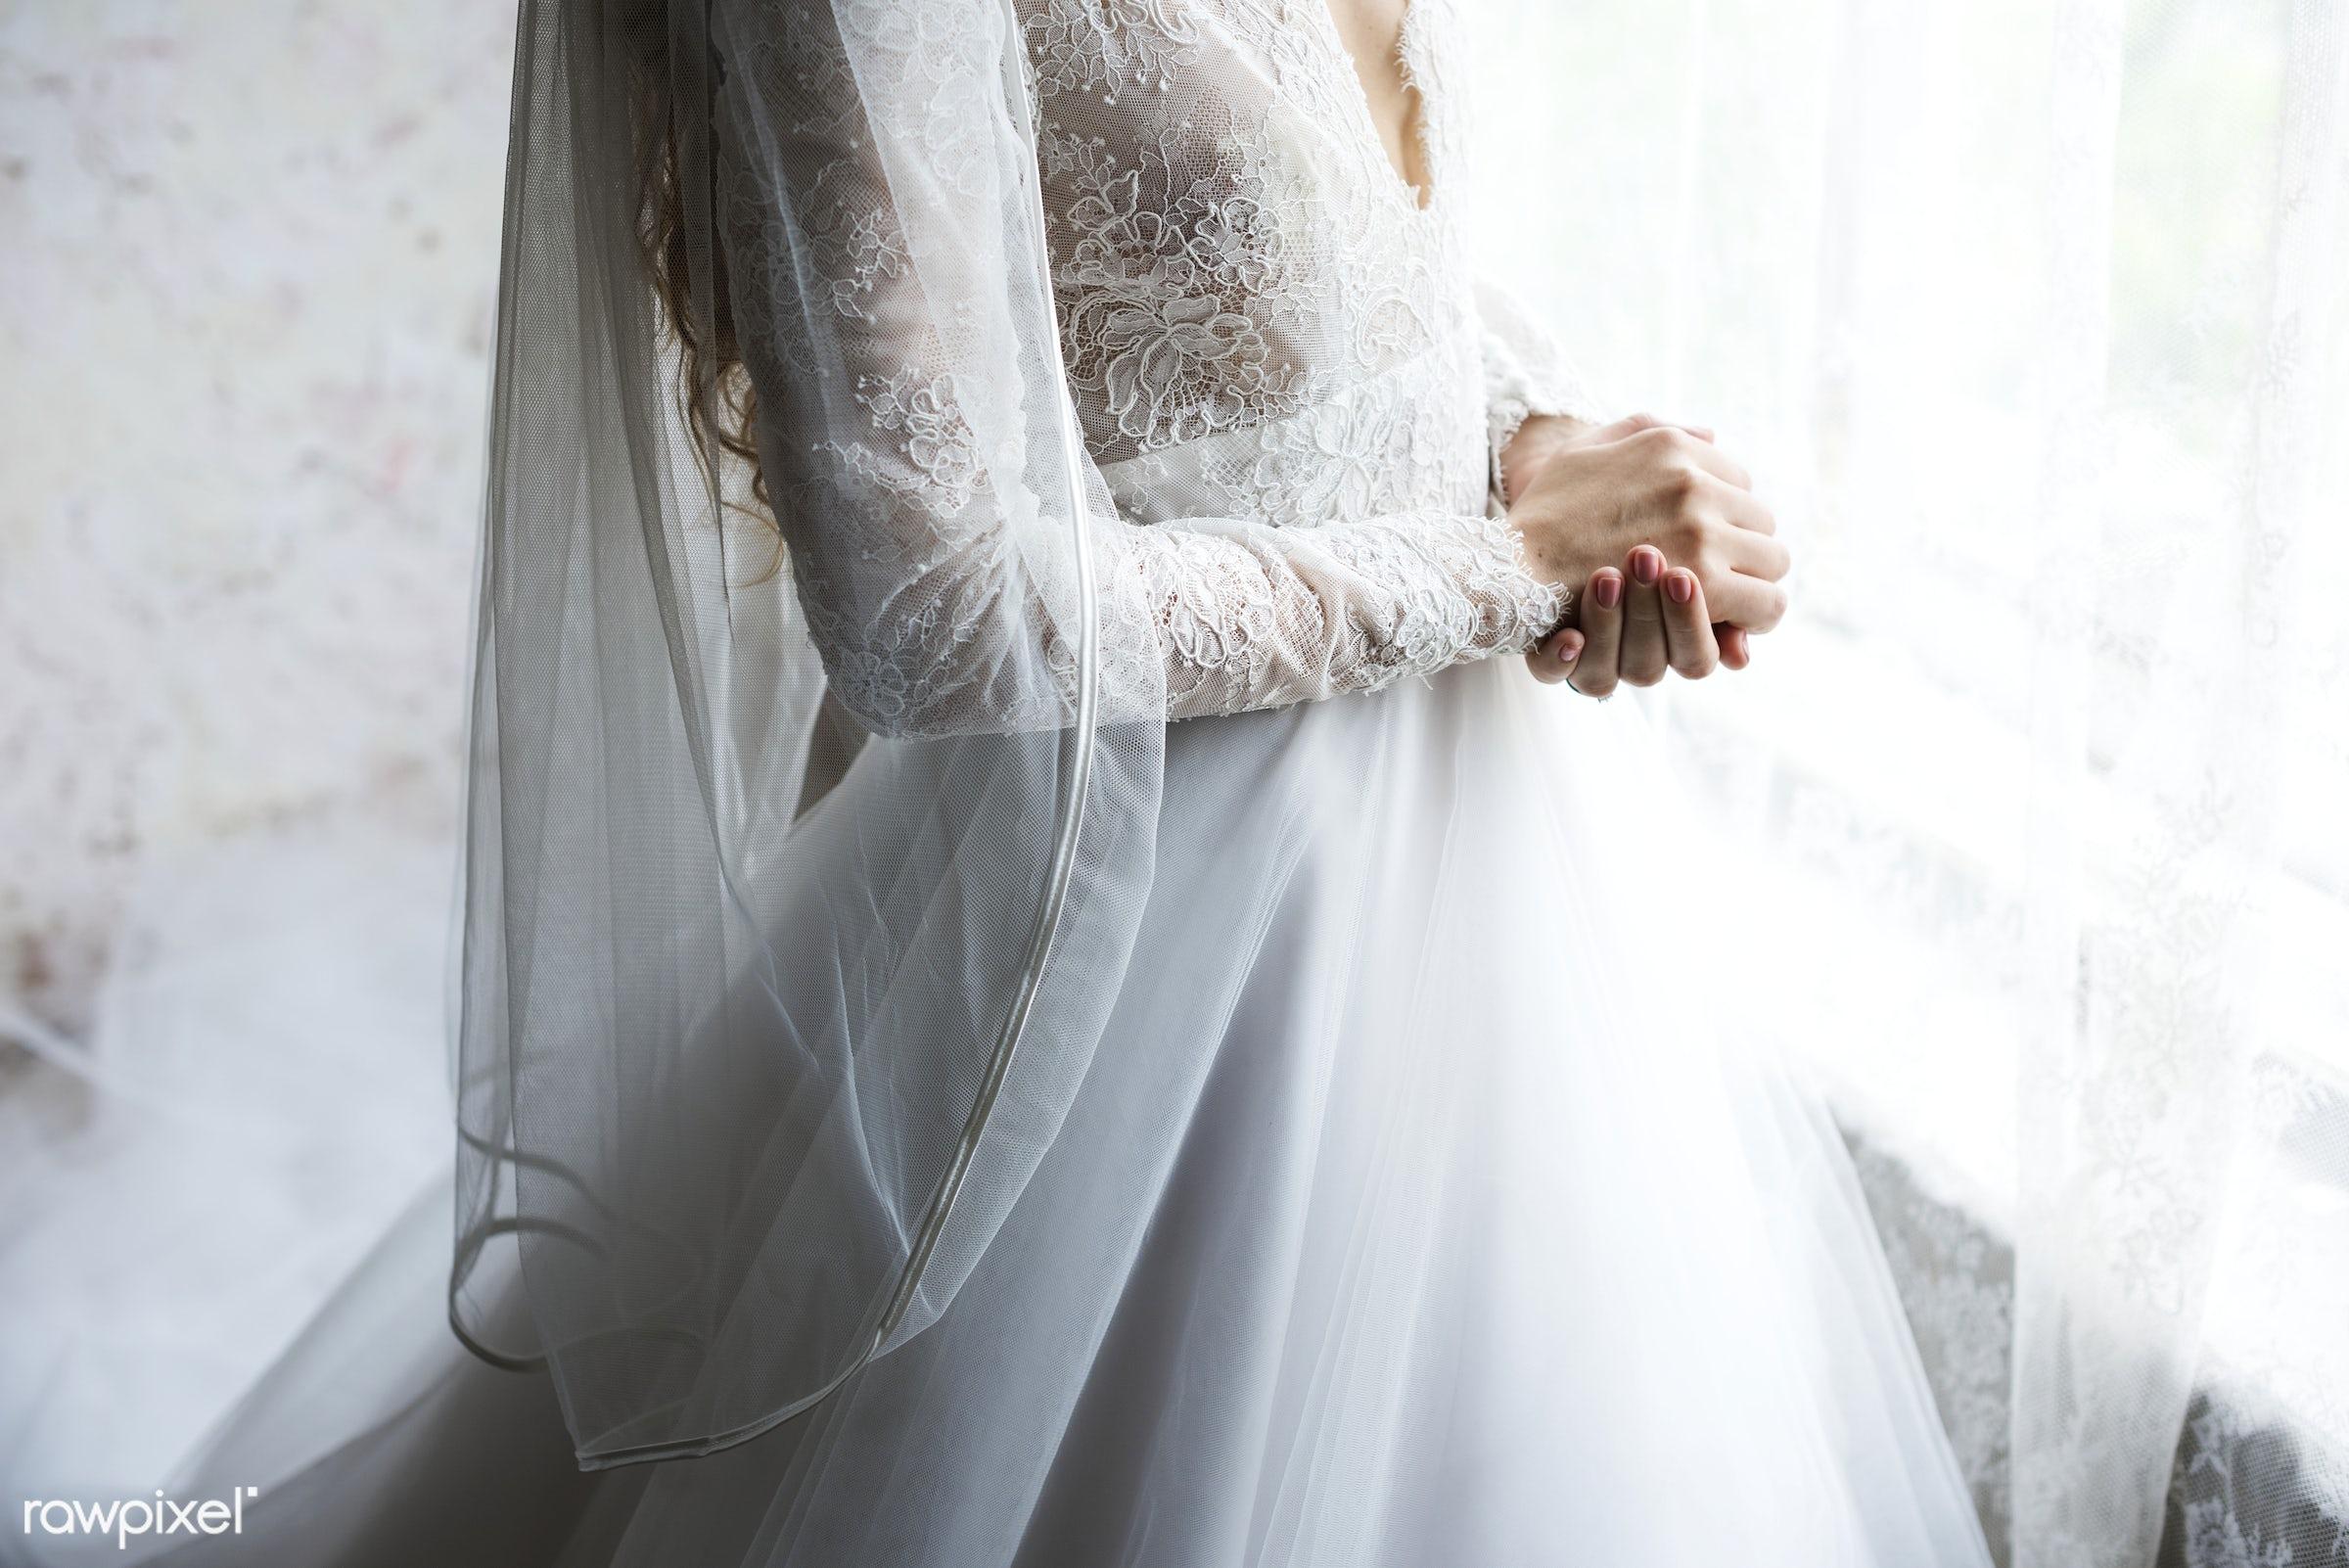 Attractive Beautiful Bride in a Wedding White Dress - bride, bridal, wedding, adult, attractive, beautiful, celebration,...